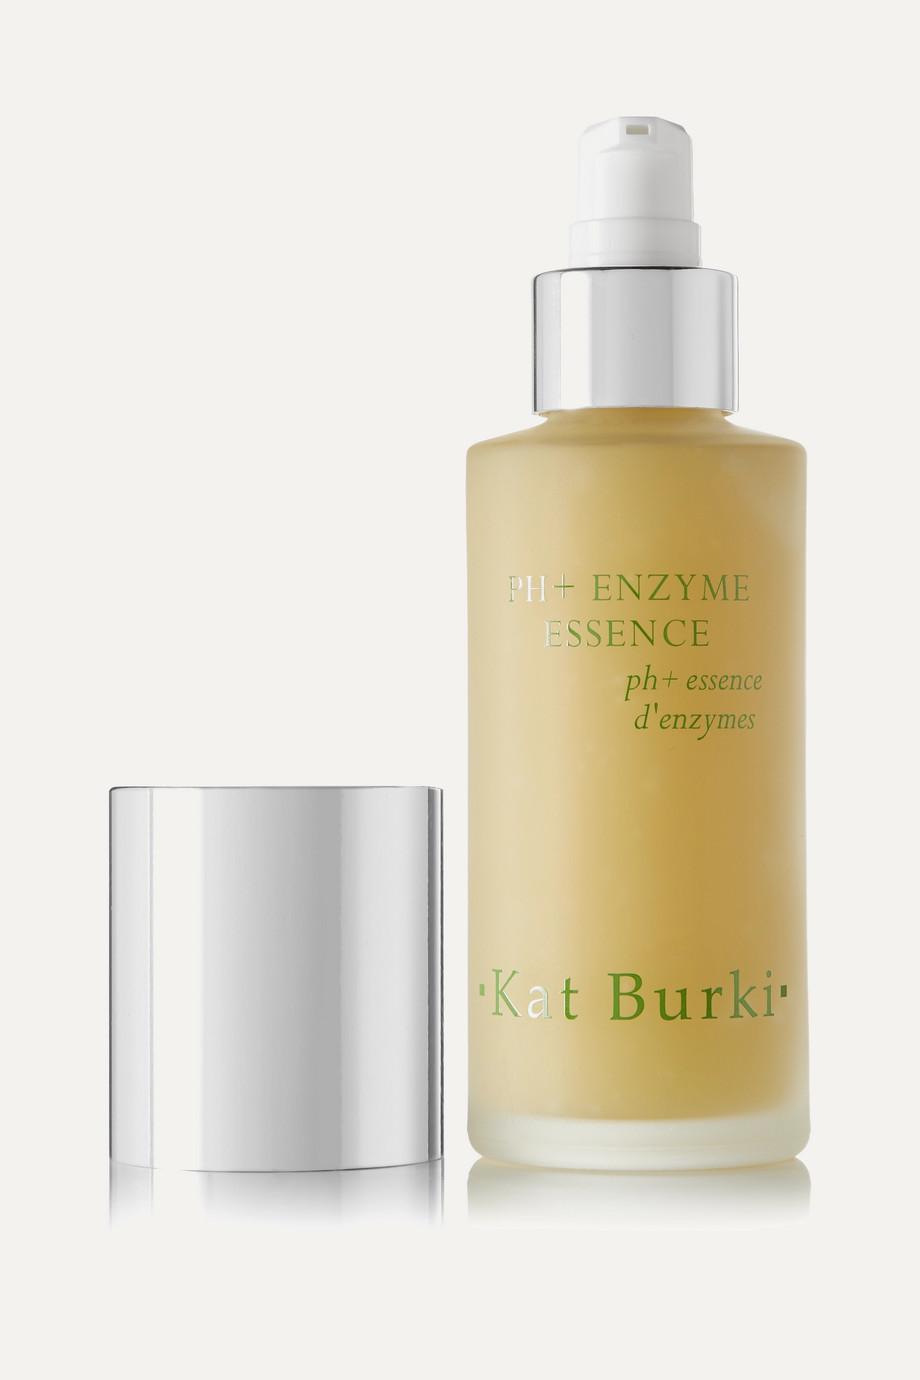 Kat Burki PH+ Enzyme Essence, 100ml